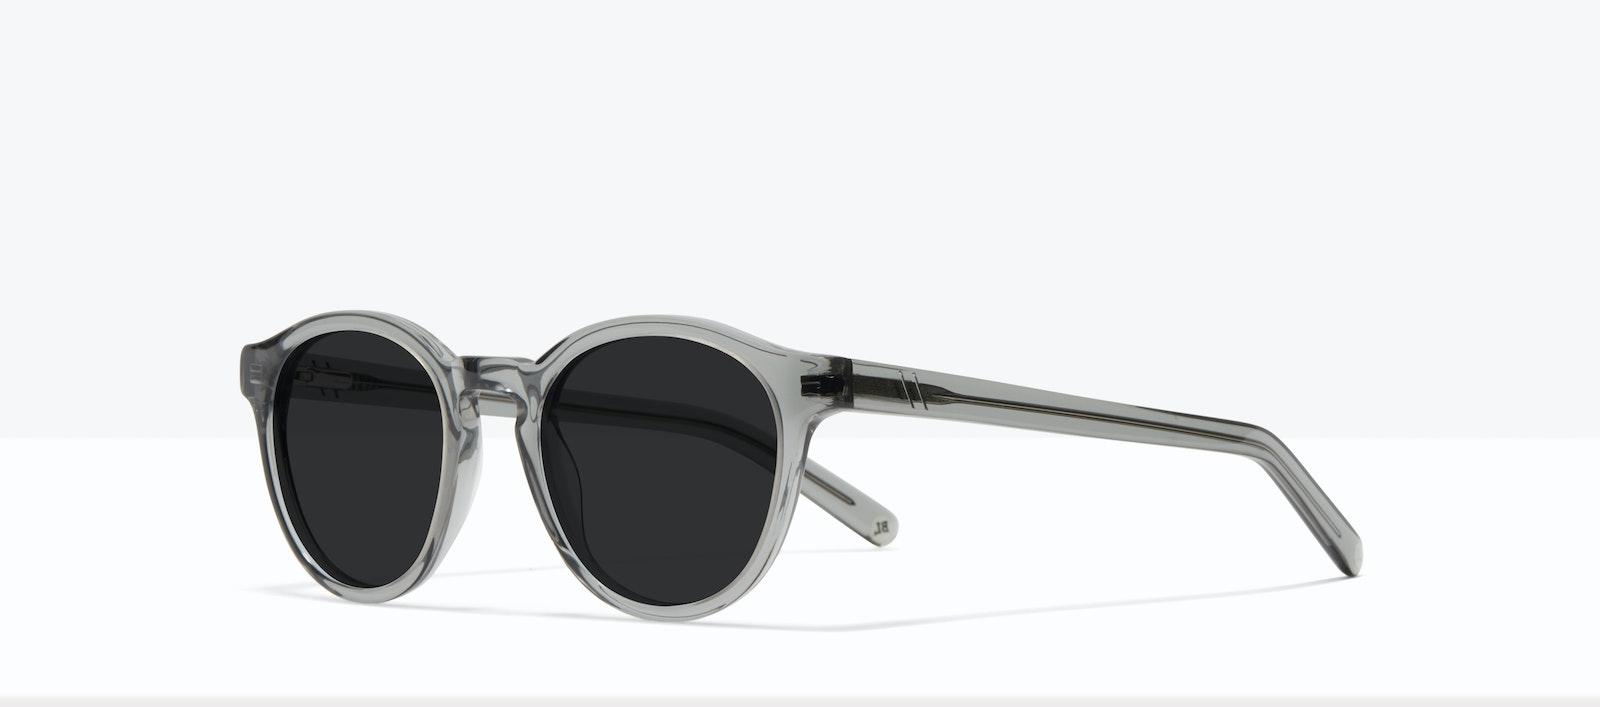 Affordable Fashion Glasses Round Sunglasses Men Gent S Storm Tilt